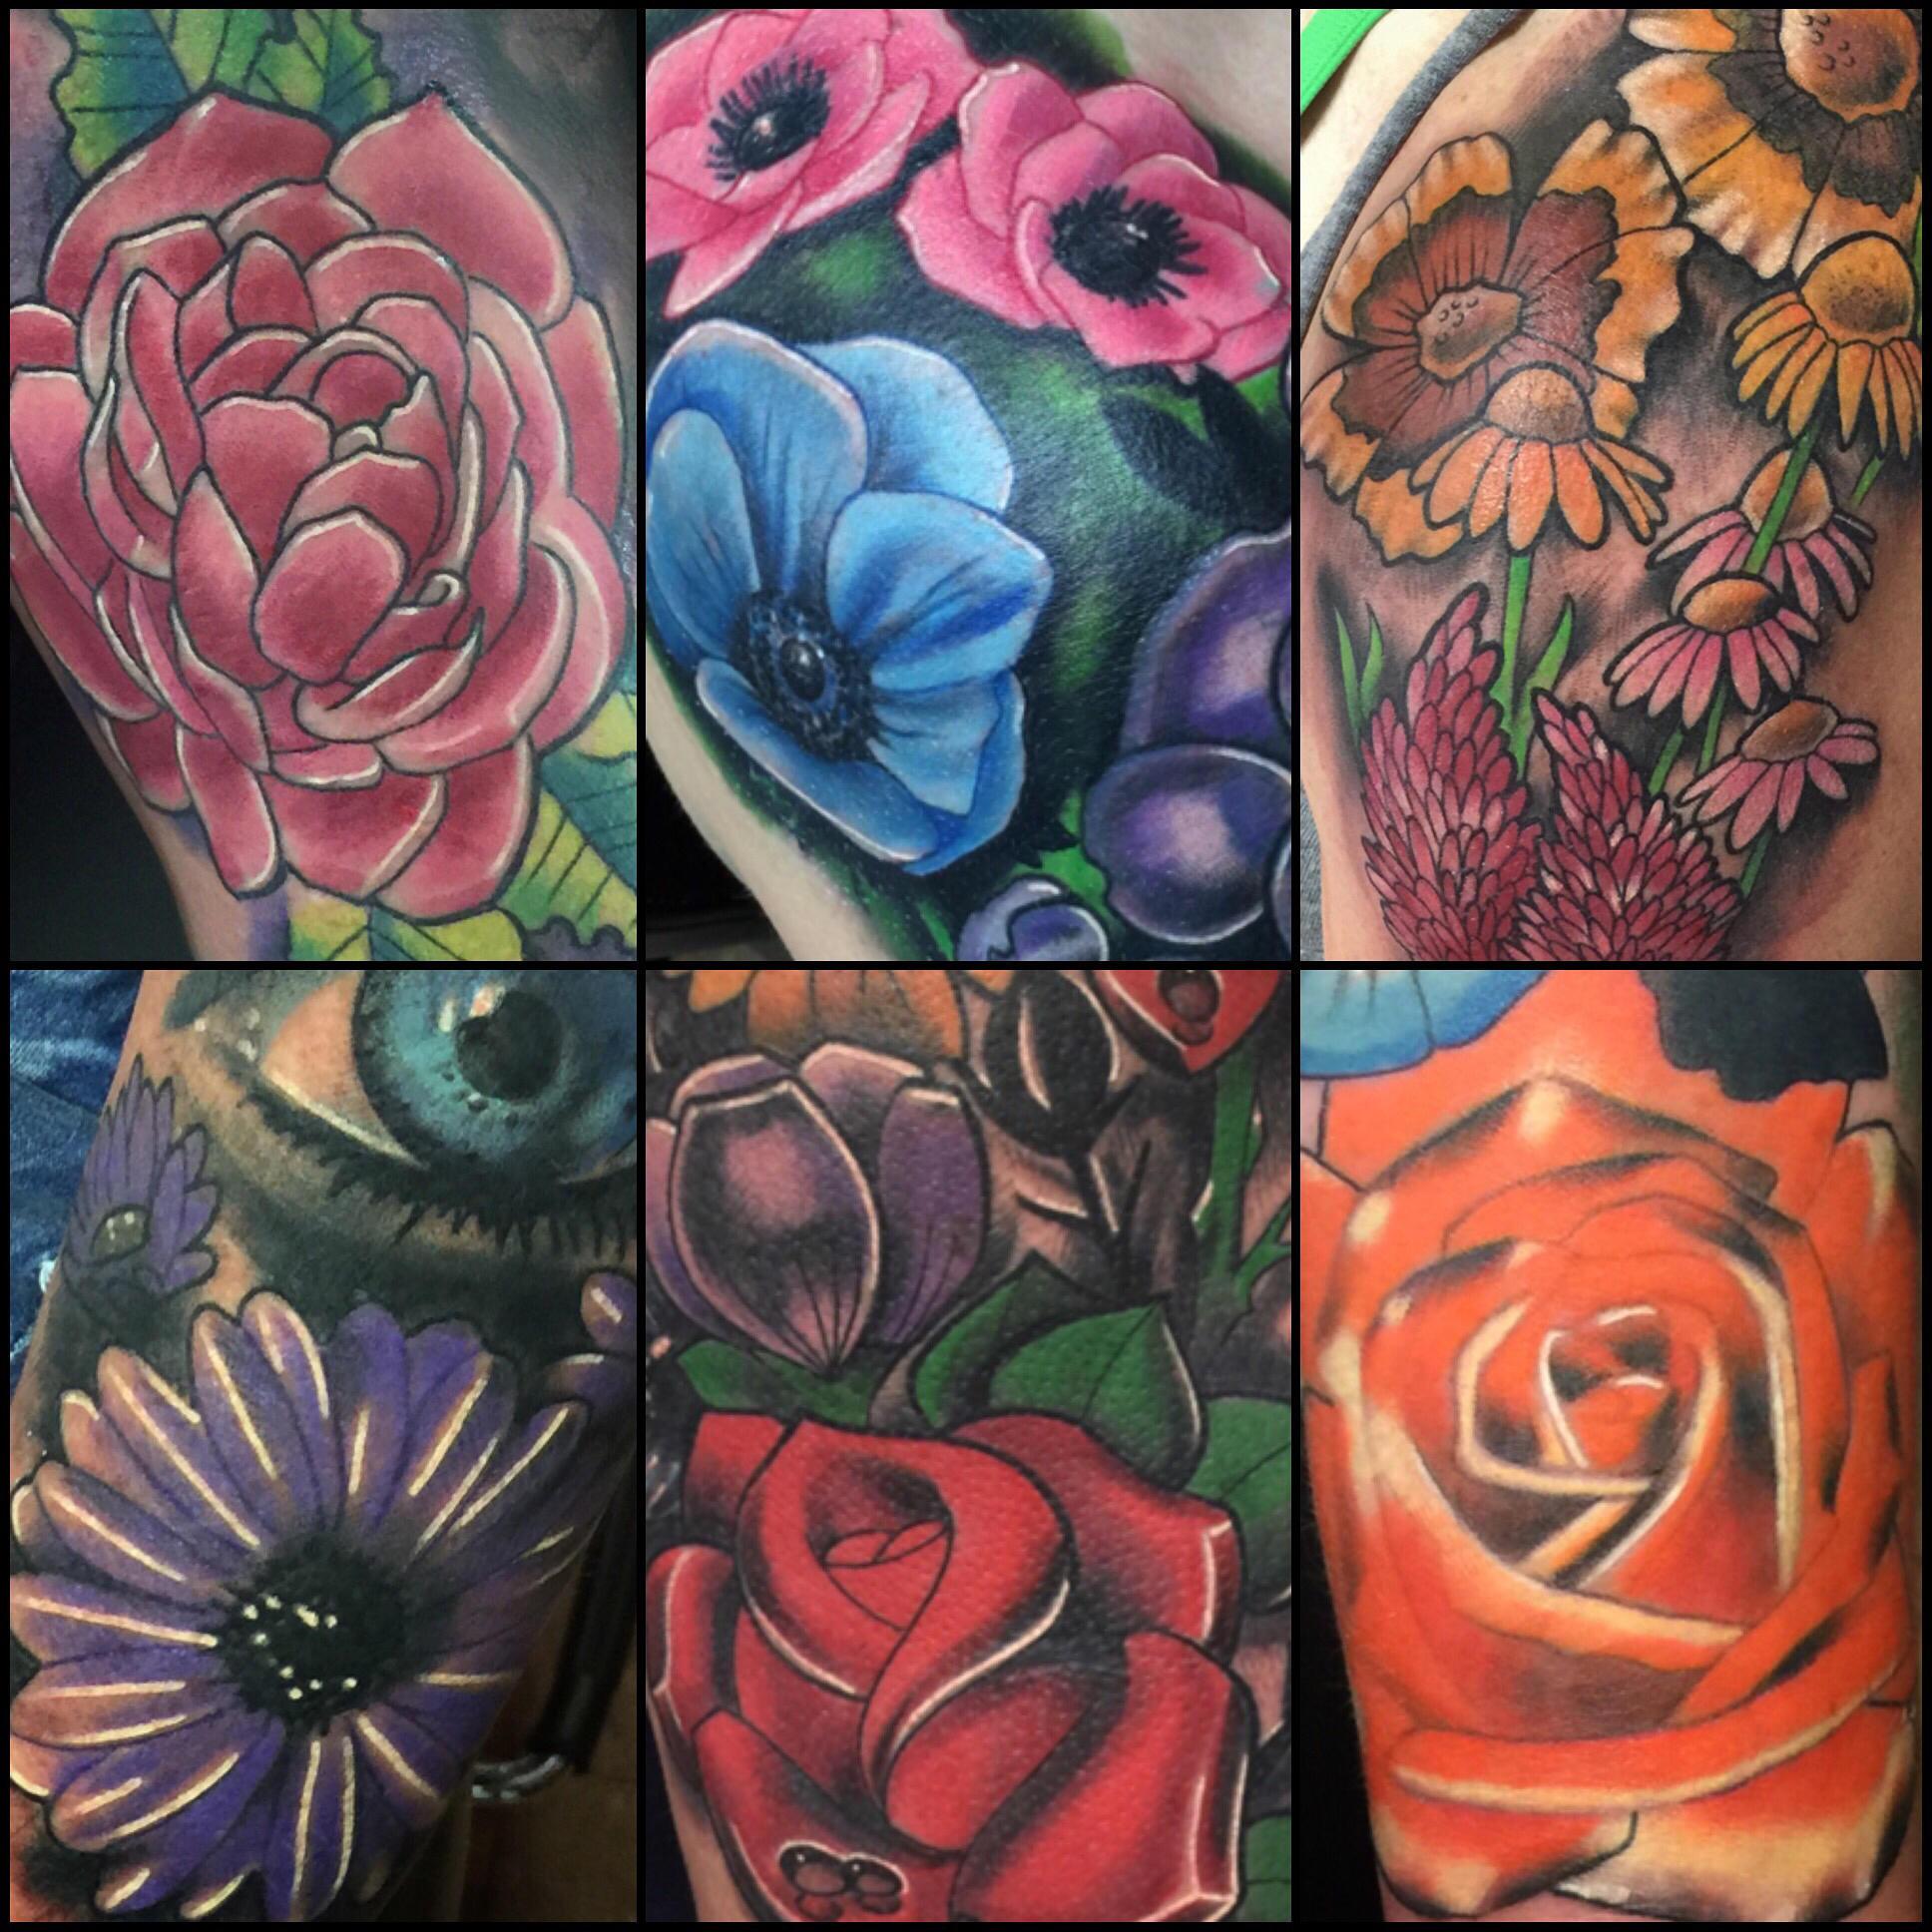 Golden Lotus Tattoo Studio image 6